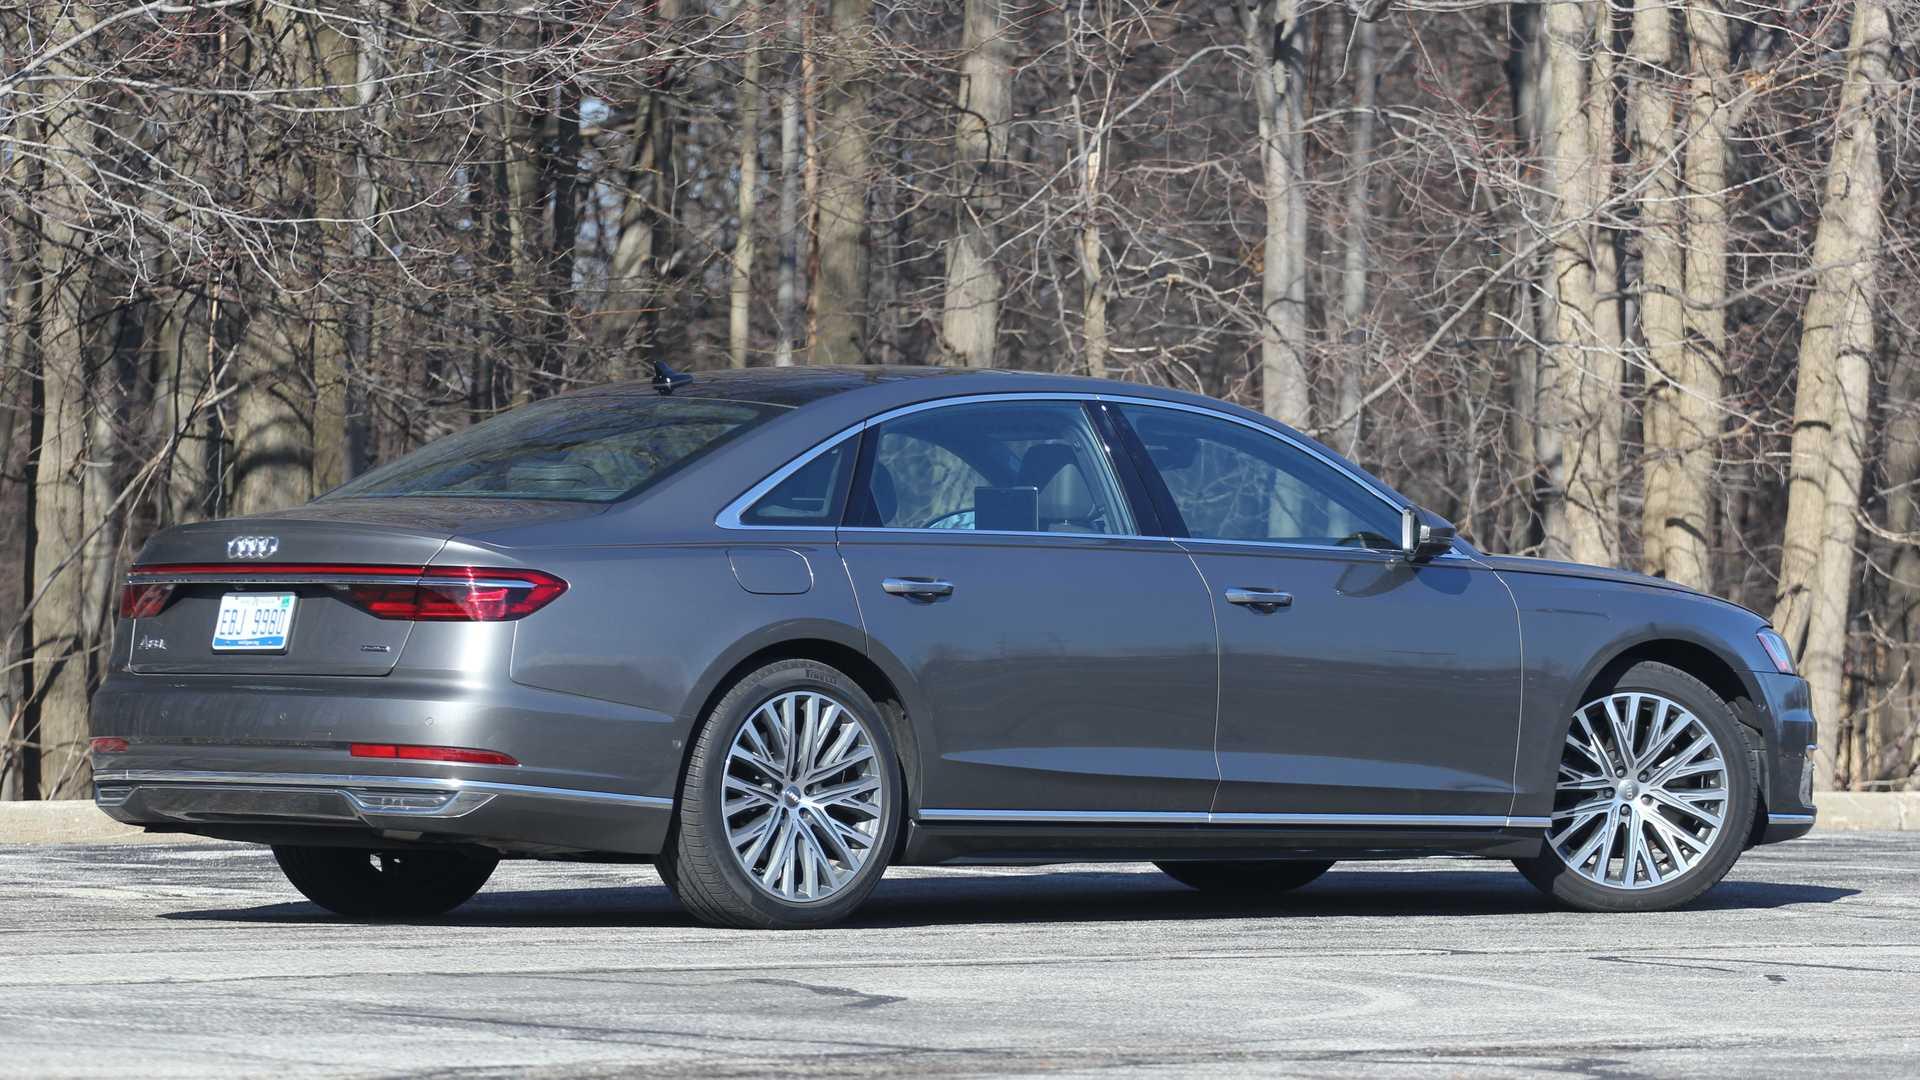 Audi A8 – JM Auto Leasing